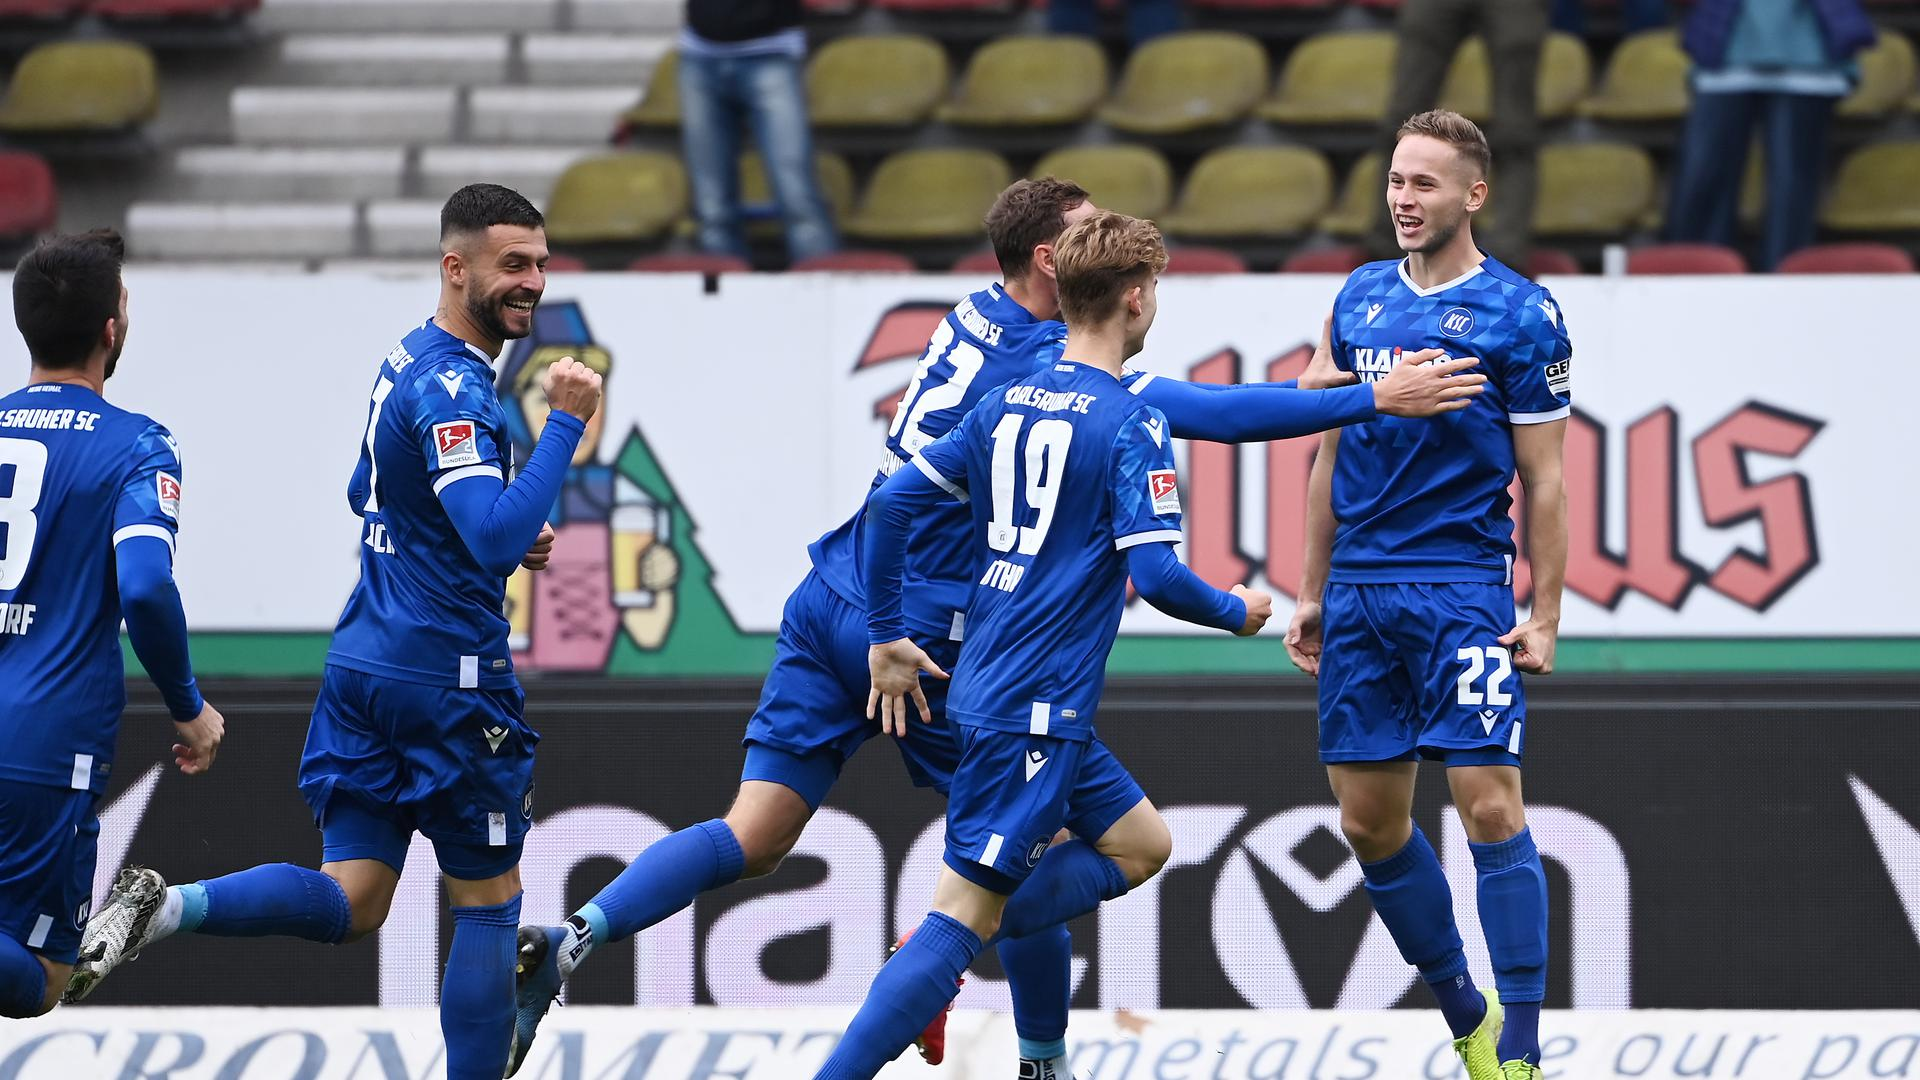 Torjubel nach dem 3-0: Jerome Gondorf (KSC), Marco Djuricin (KSC), Robin Bormuth (KSC), Dominik Kother (KSC) und Torschuetze Christoph Kobald (KSC) jubeln (von links).  GES/ Fussball/ 2. Bundesliga: Karlsruher SC - SV Sandhausen, 17.10.2020  Football / Soccer: 2. German League: Karlsruhe vs Sandhausen,  Karlsruhe, October 17, 2020